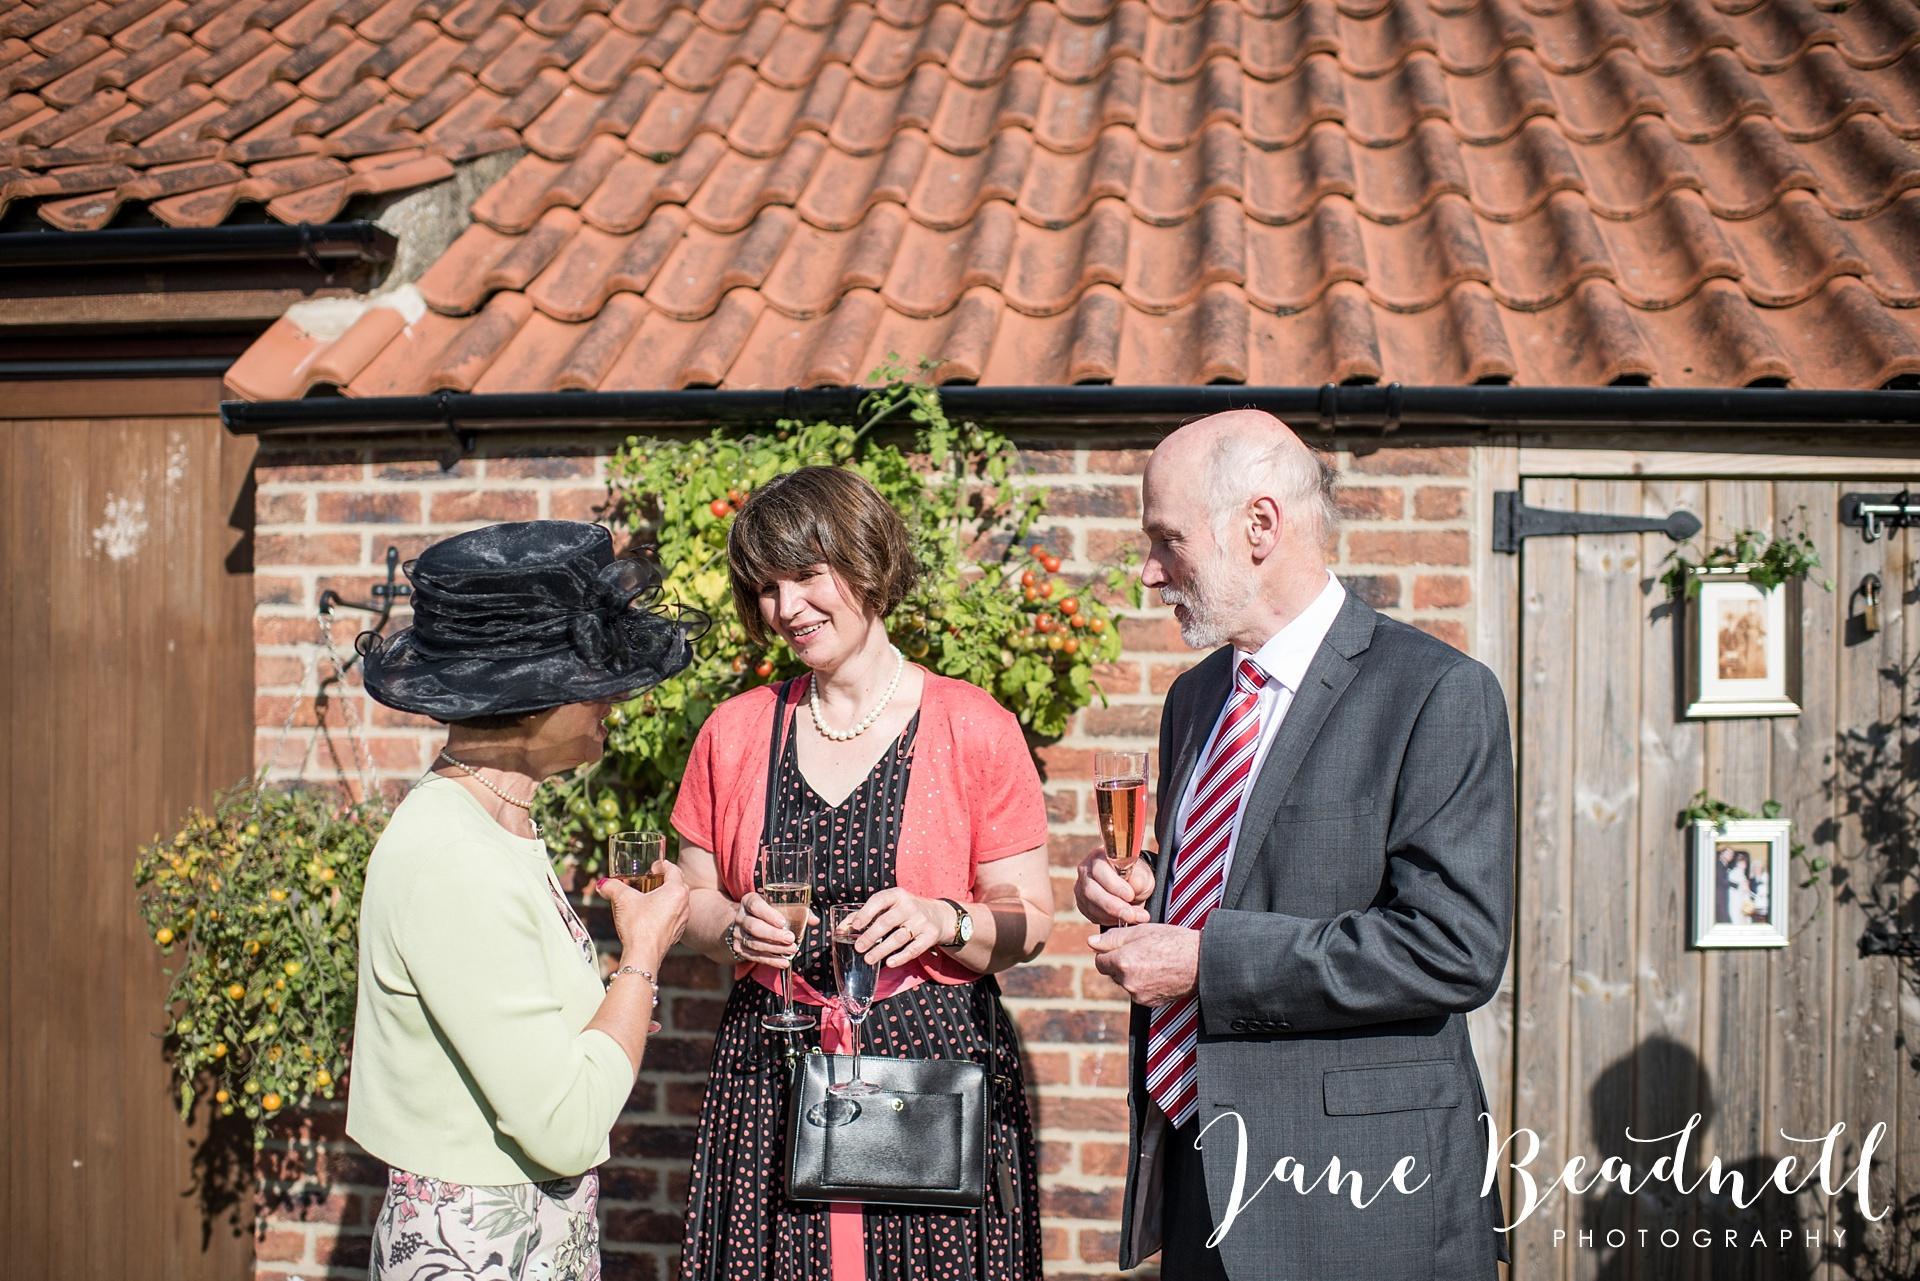 fine-art-wedding-photographer-jane-beadnell-yorkshire-wedding-photographer-garden-wedding_0076